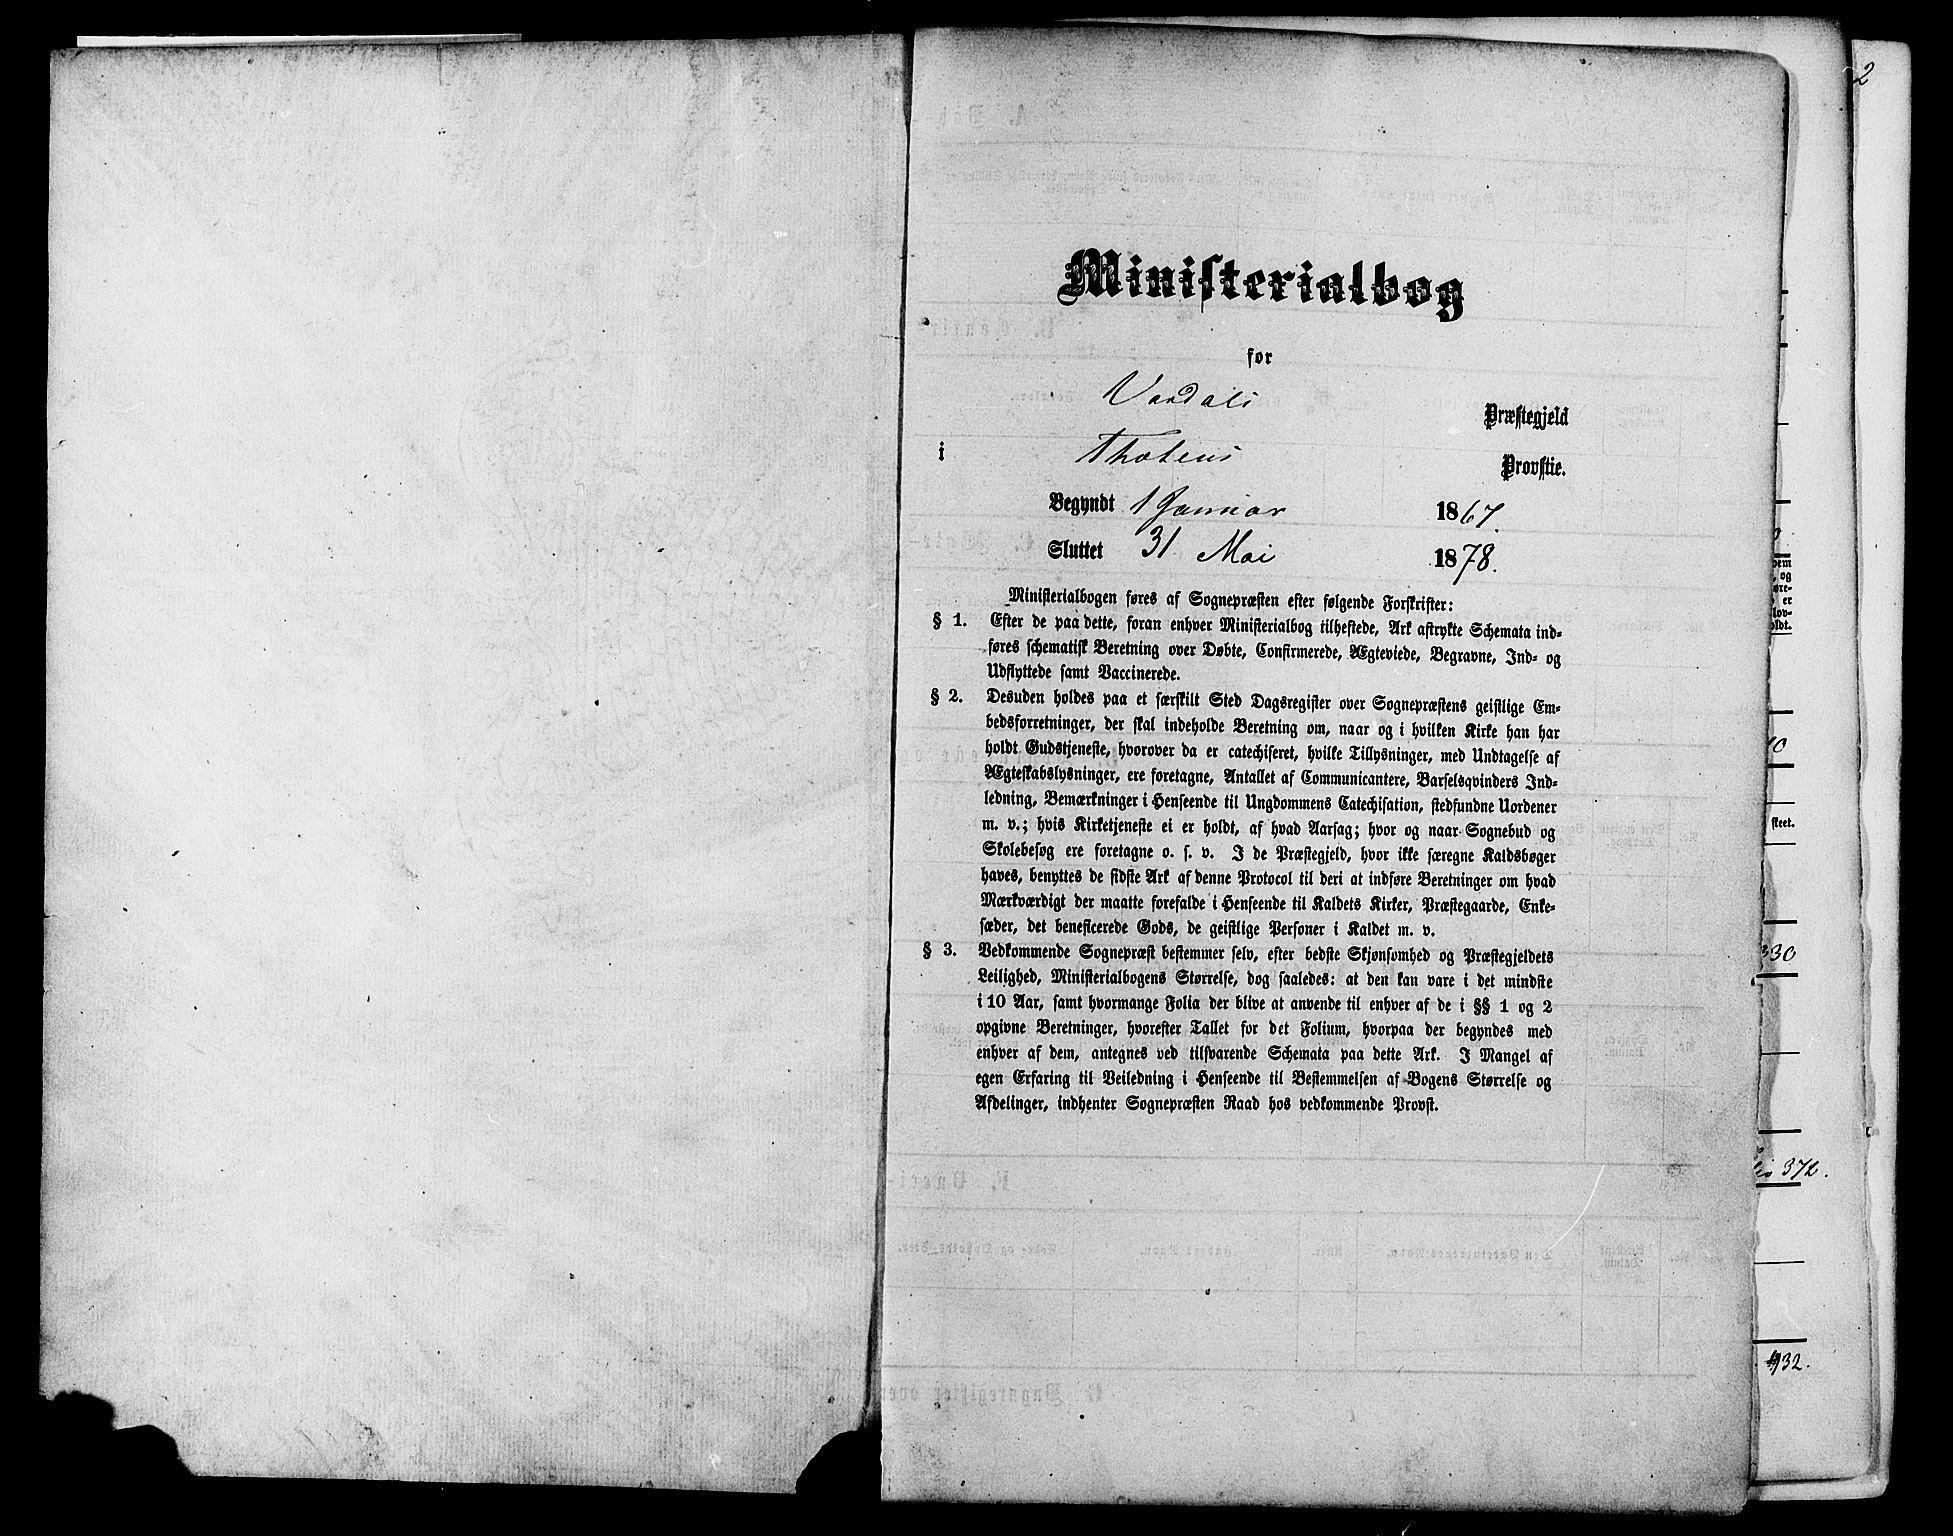 SAH, Vardal prestekontor, H/Ha/Haa/L0007: Ministerialbok nr. 7, 1867-1878